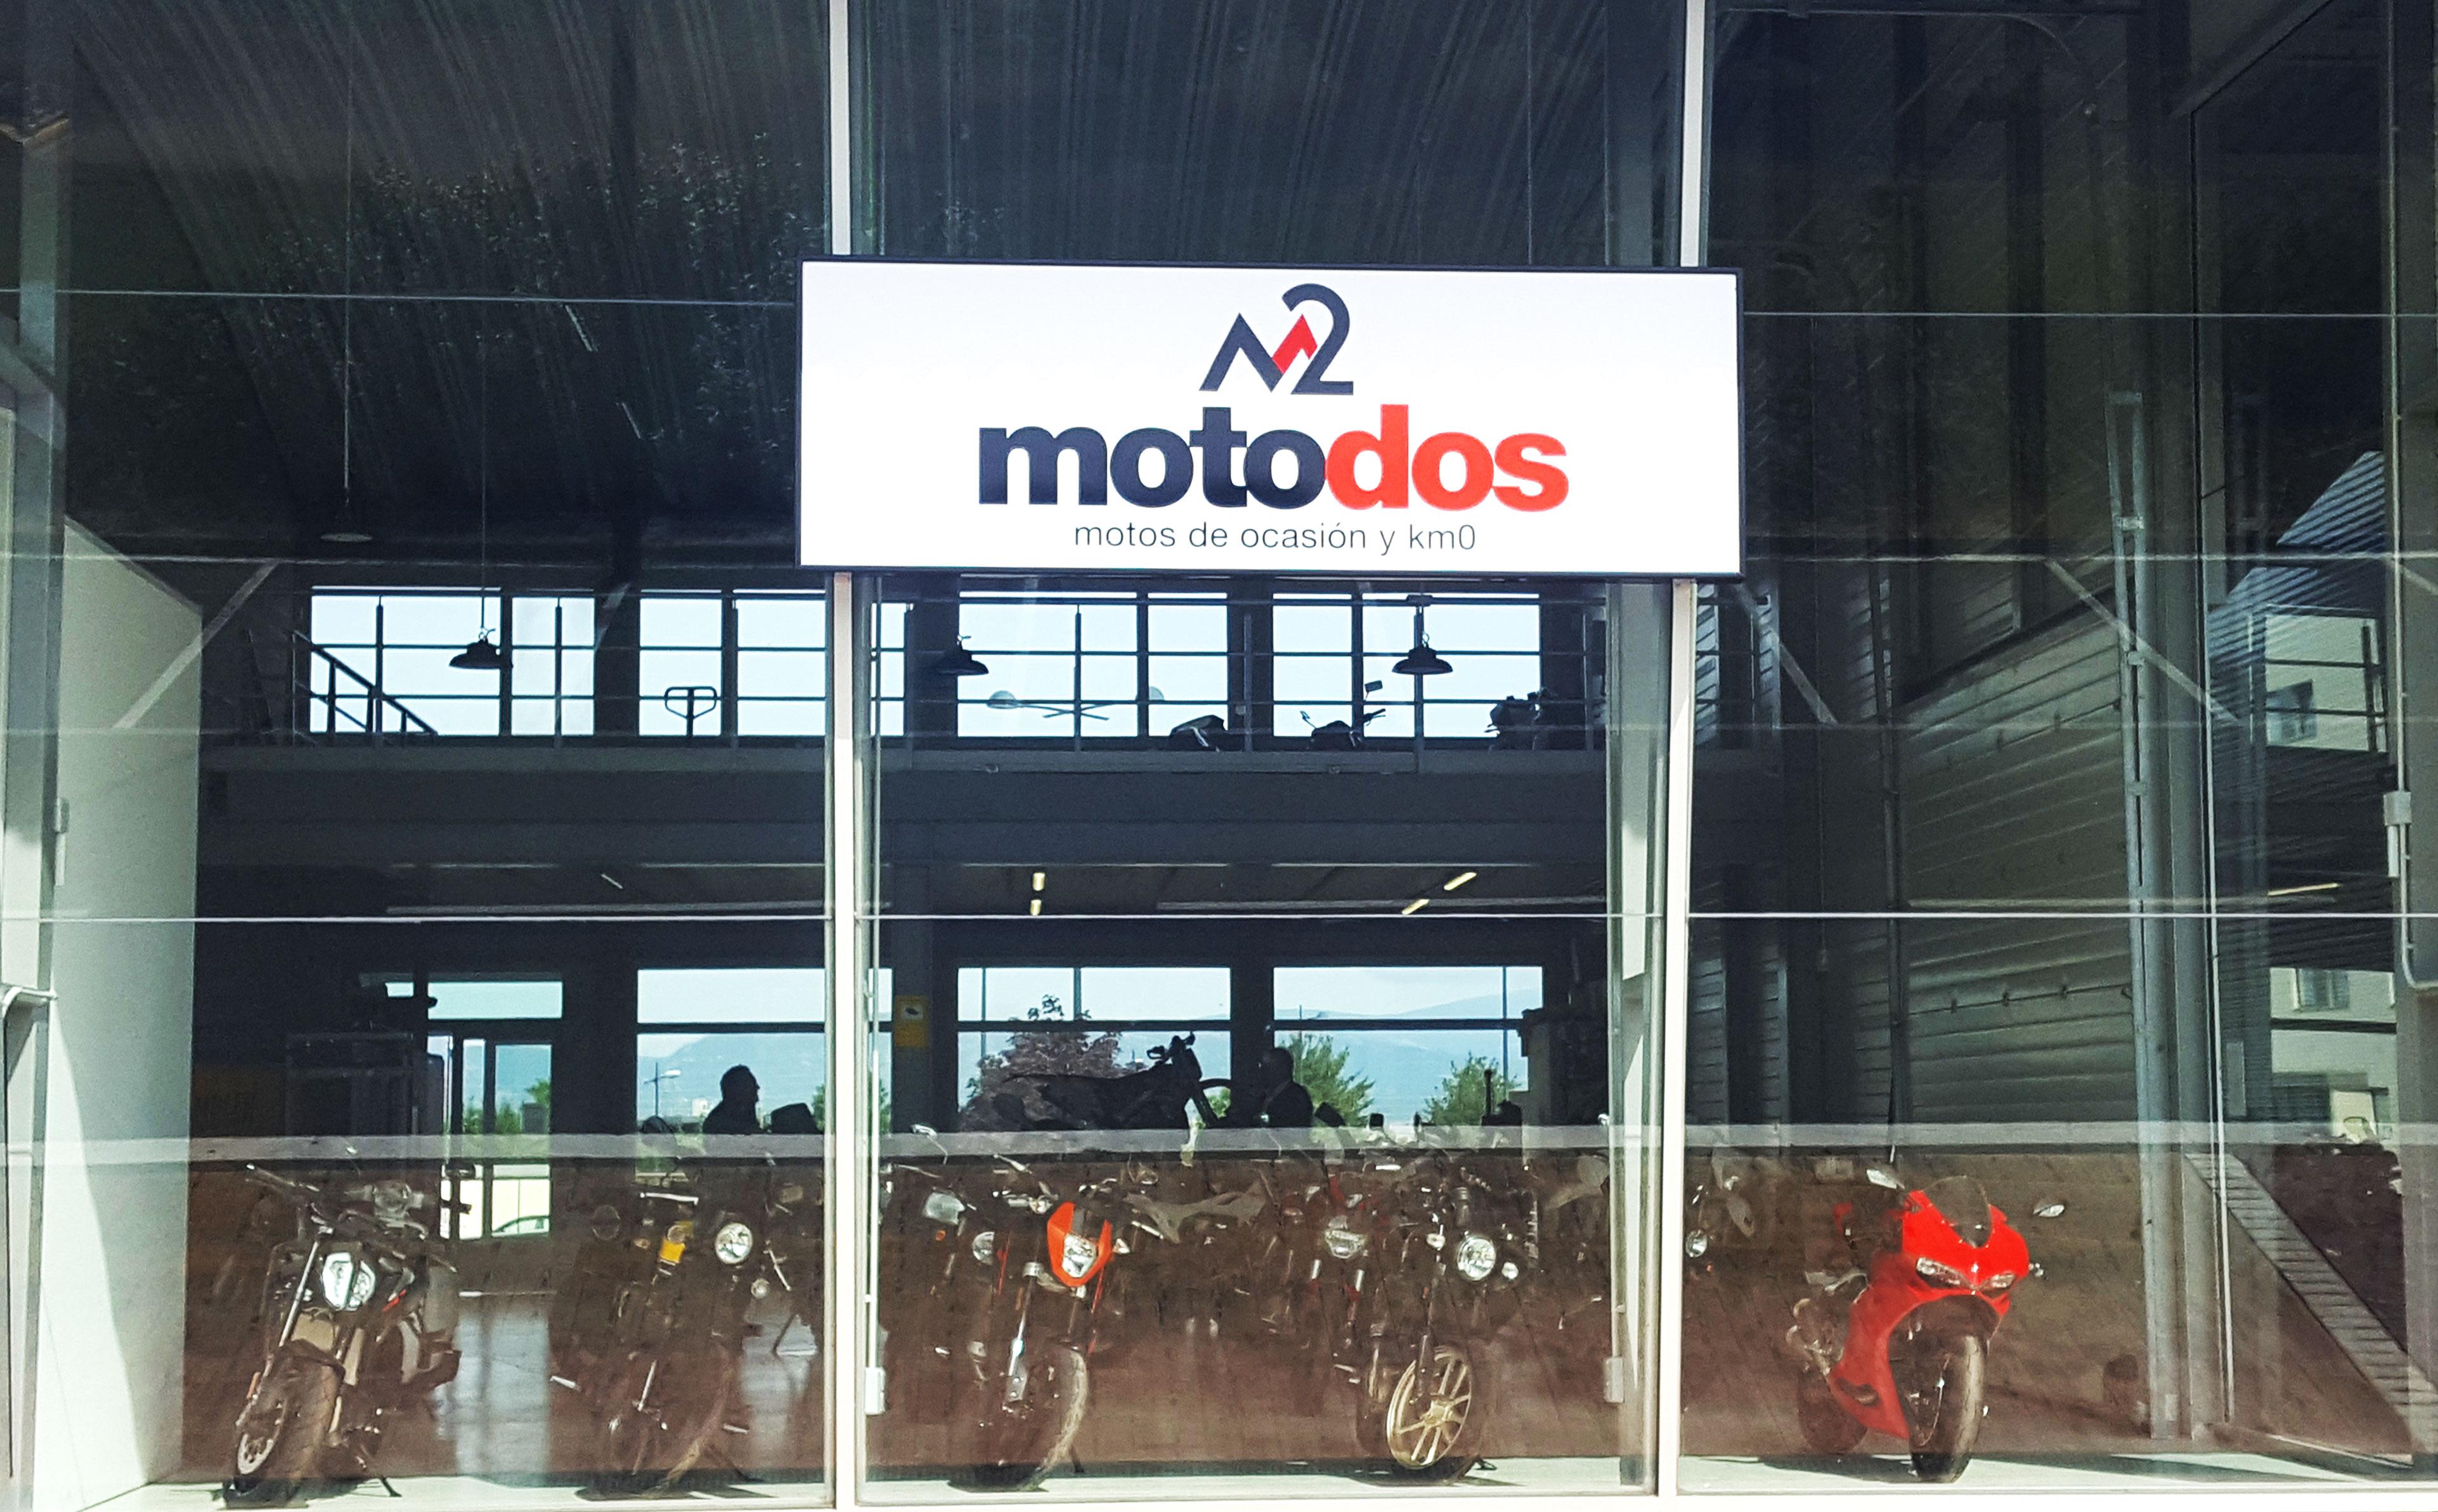 Motodos